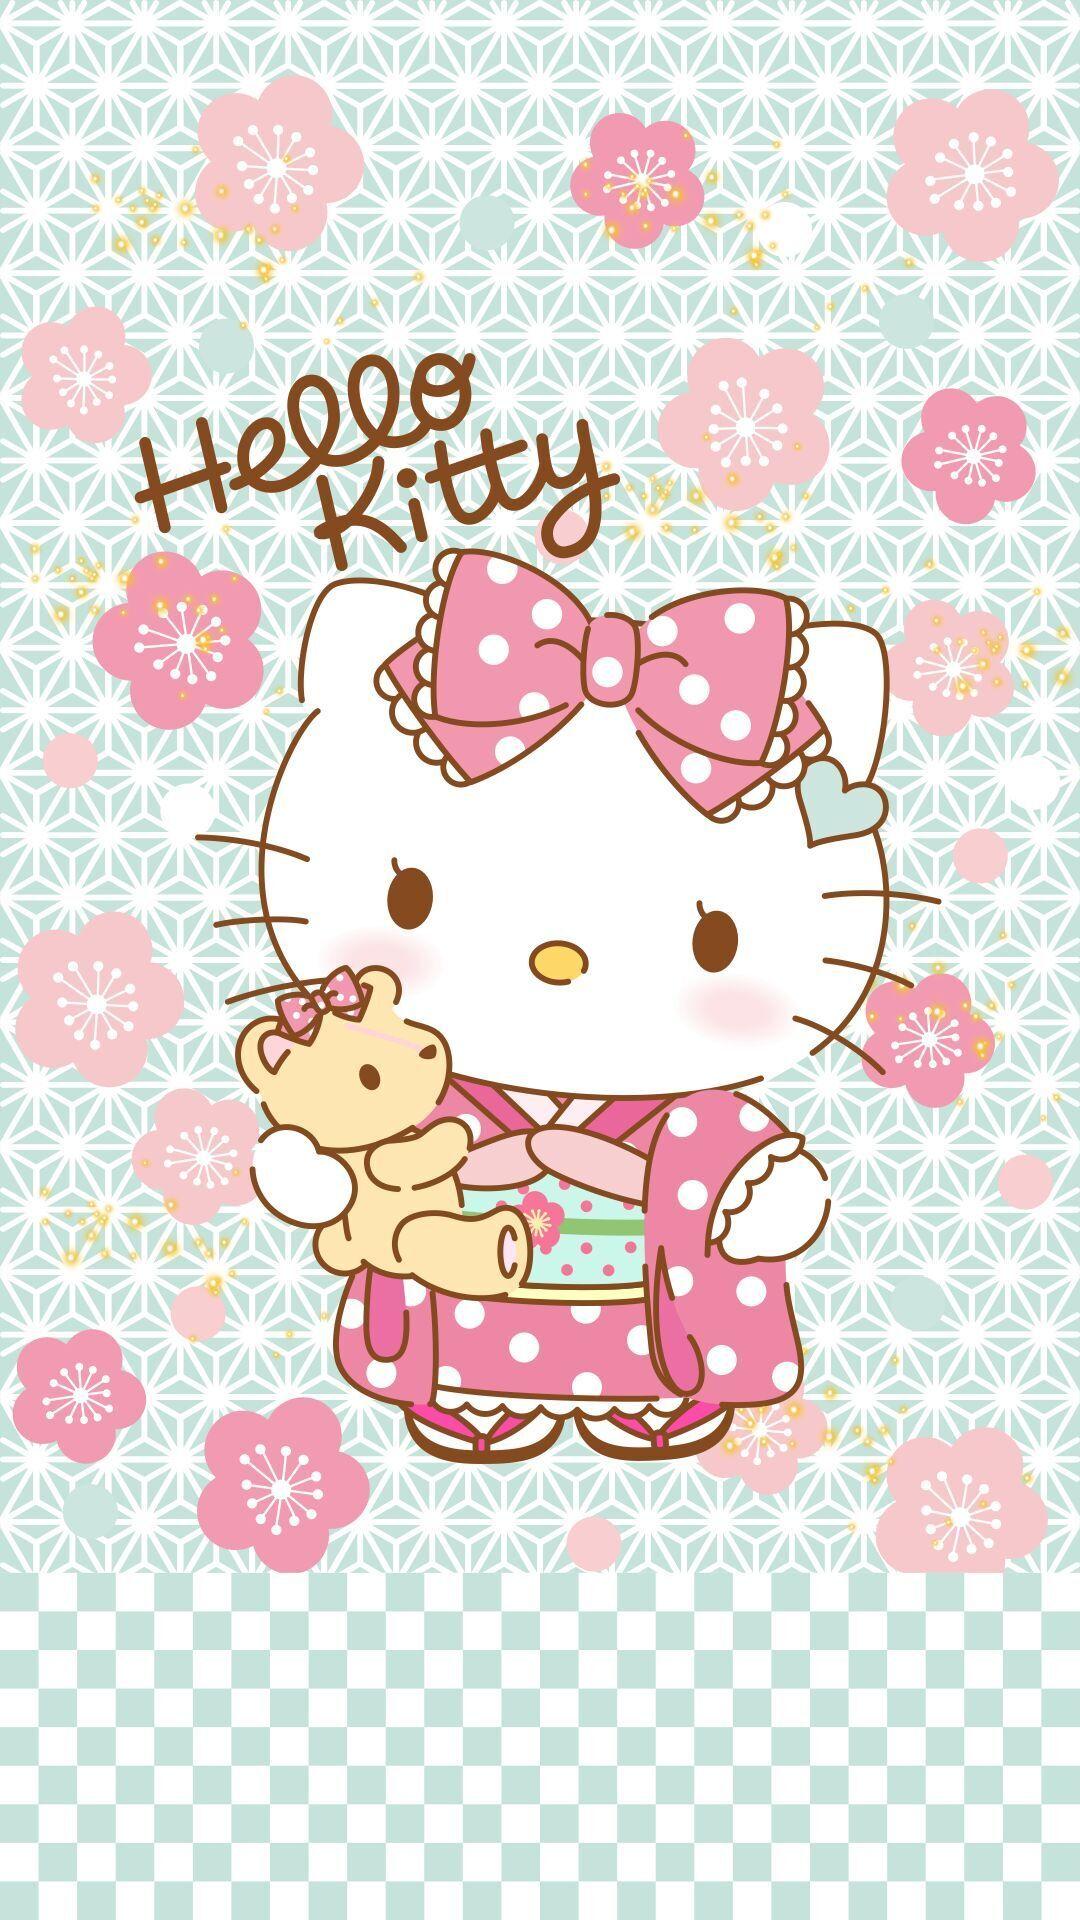 Amazing Wallpaper Hello Kitty Pattern - c5215348b9b1fcf555f82840e4d22f78  Pic_651882.jpg